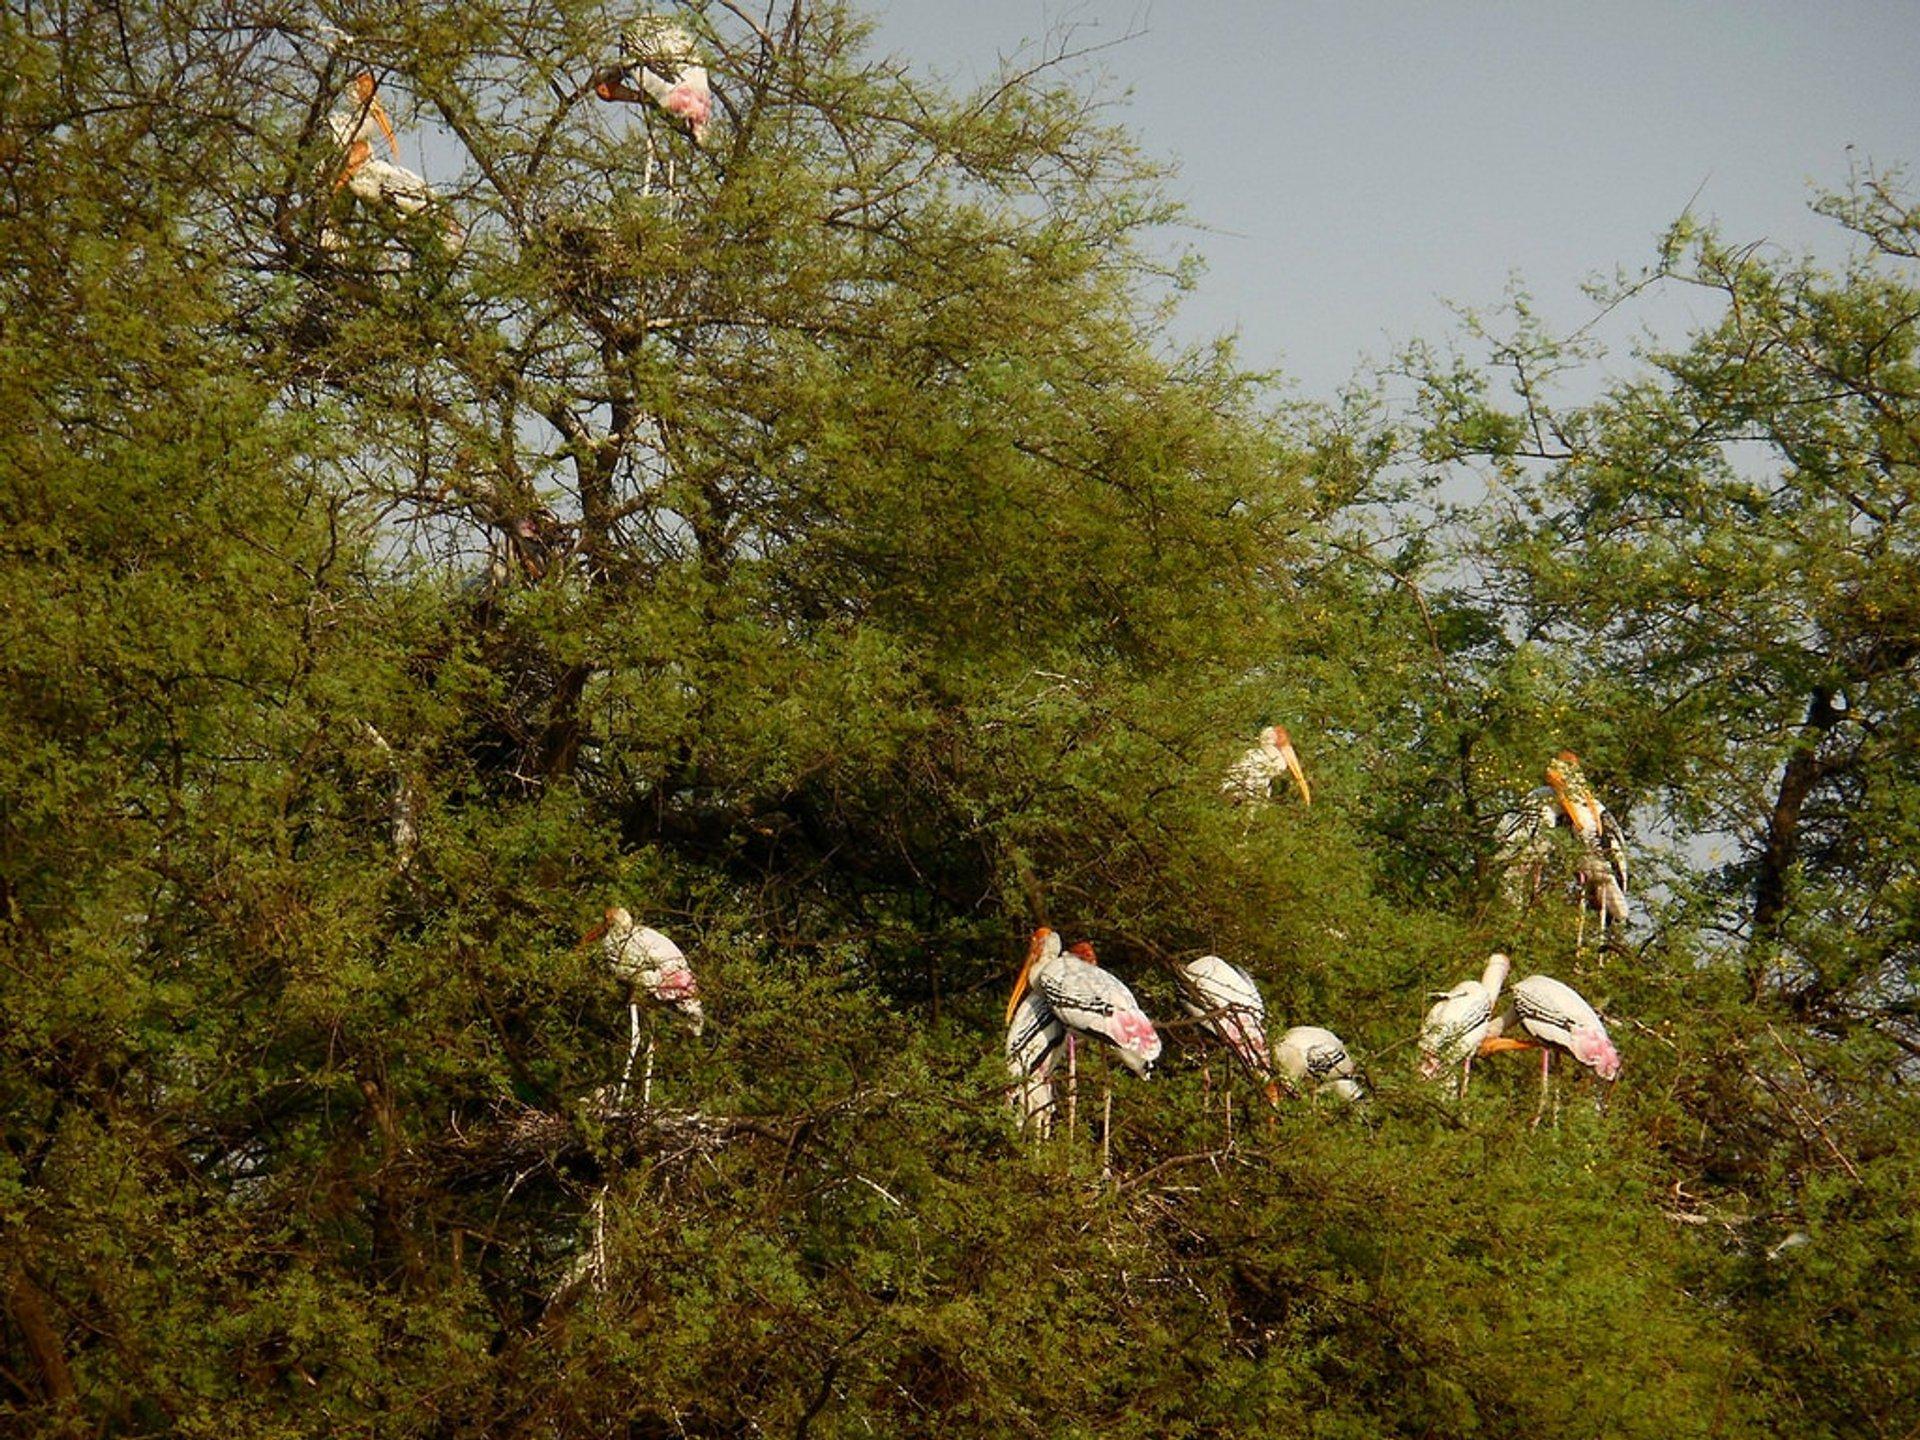 Storks in Keoladeo National Park 2020